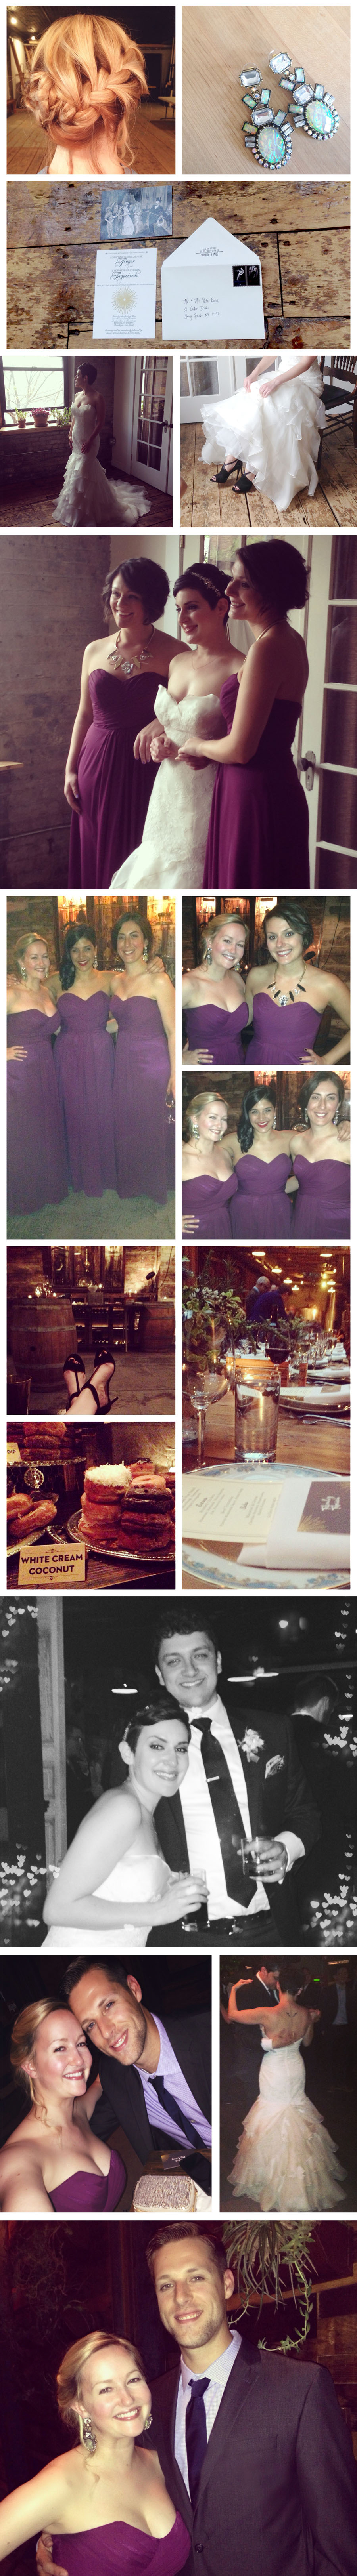 Adrienne & Steve's Wedding Pics